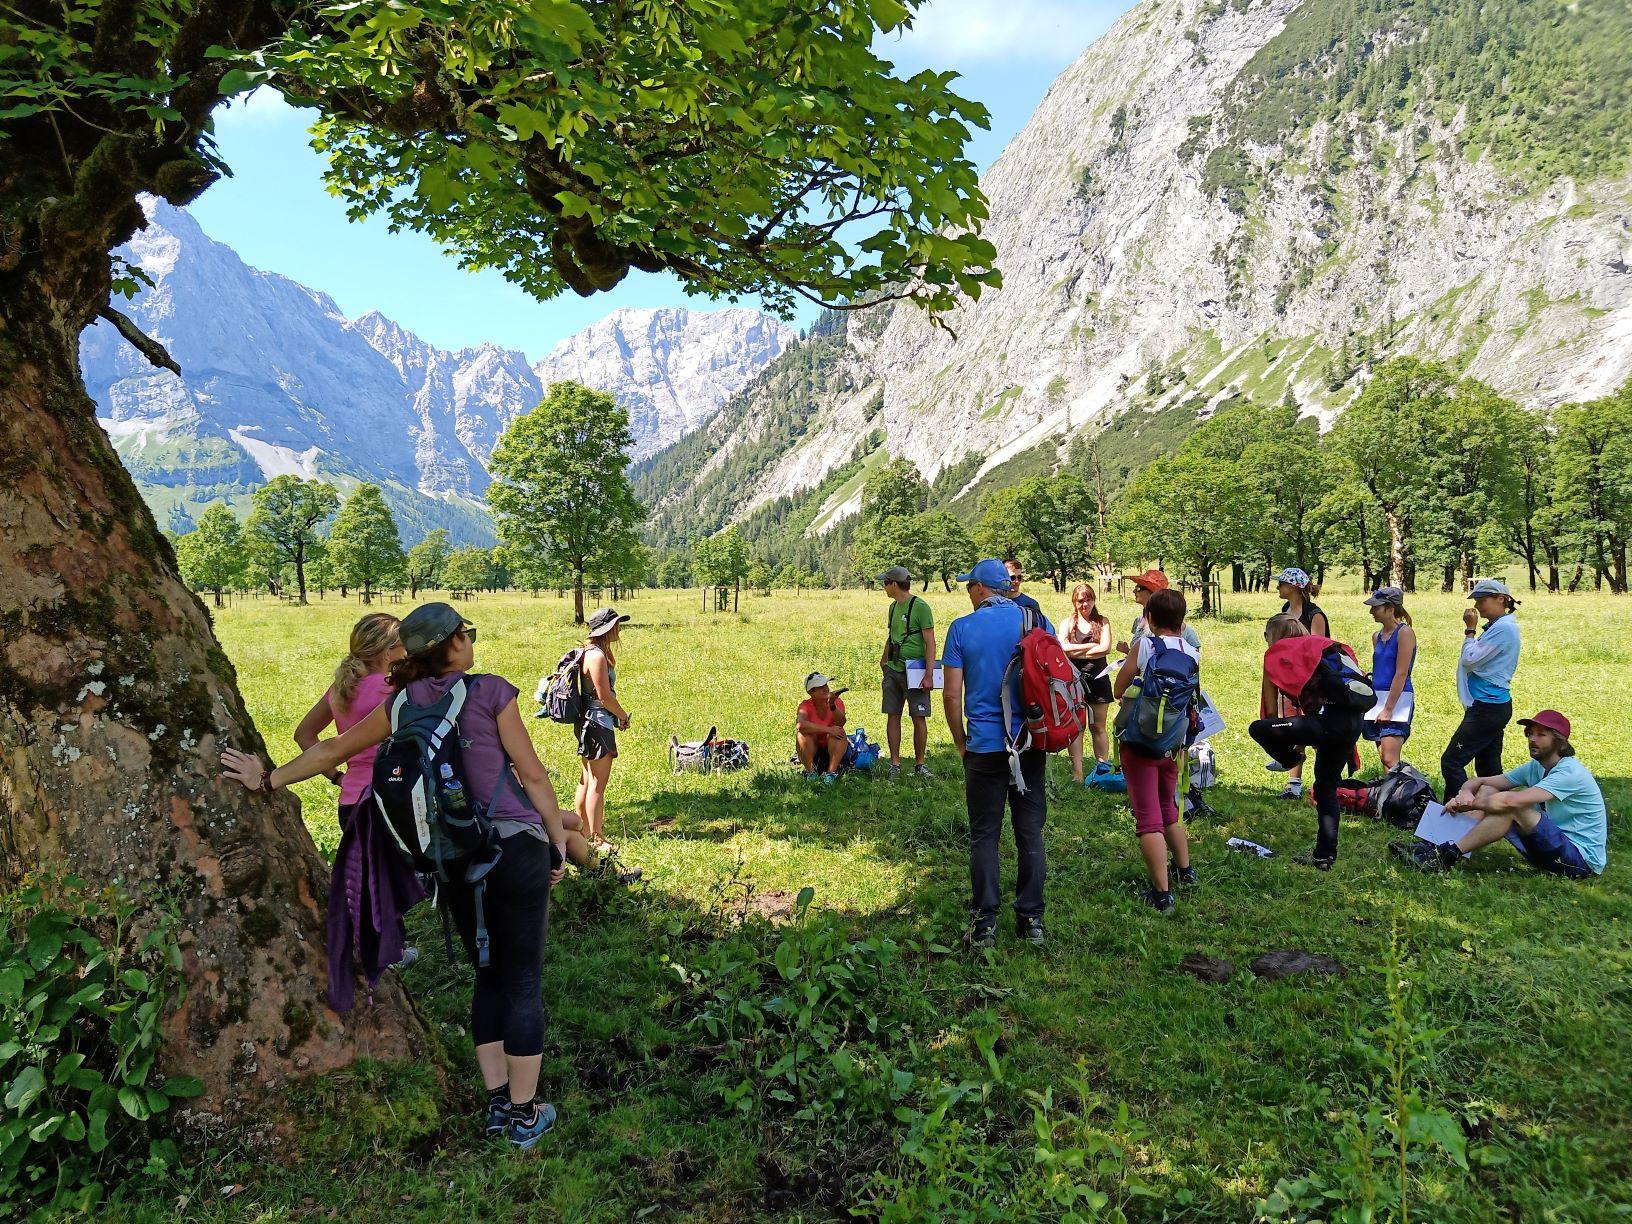 Wo Das Wasser Den Ton Angibt – Tiroler Naturführerkurs Modul 1 In Hinterriß, Naturpark Karwendel, 9.-12. Juli 2020